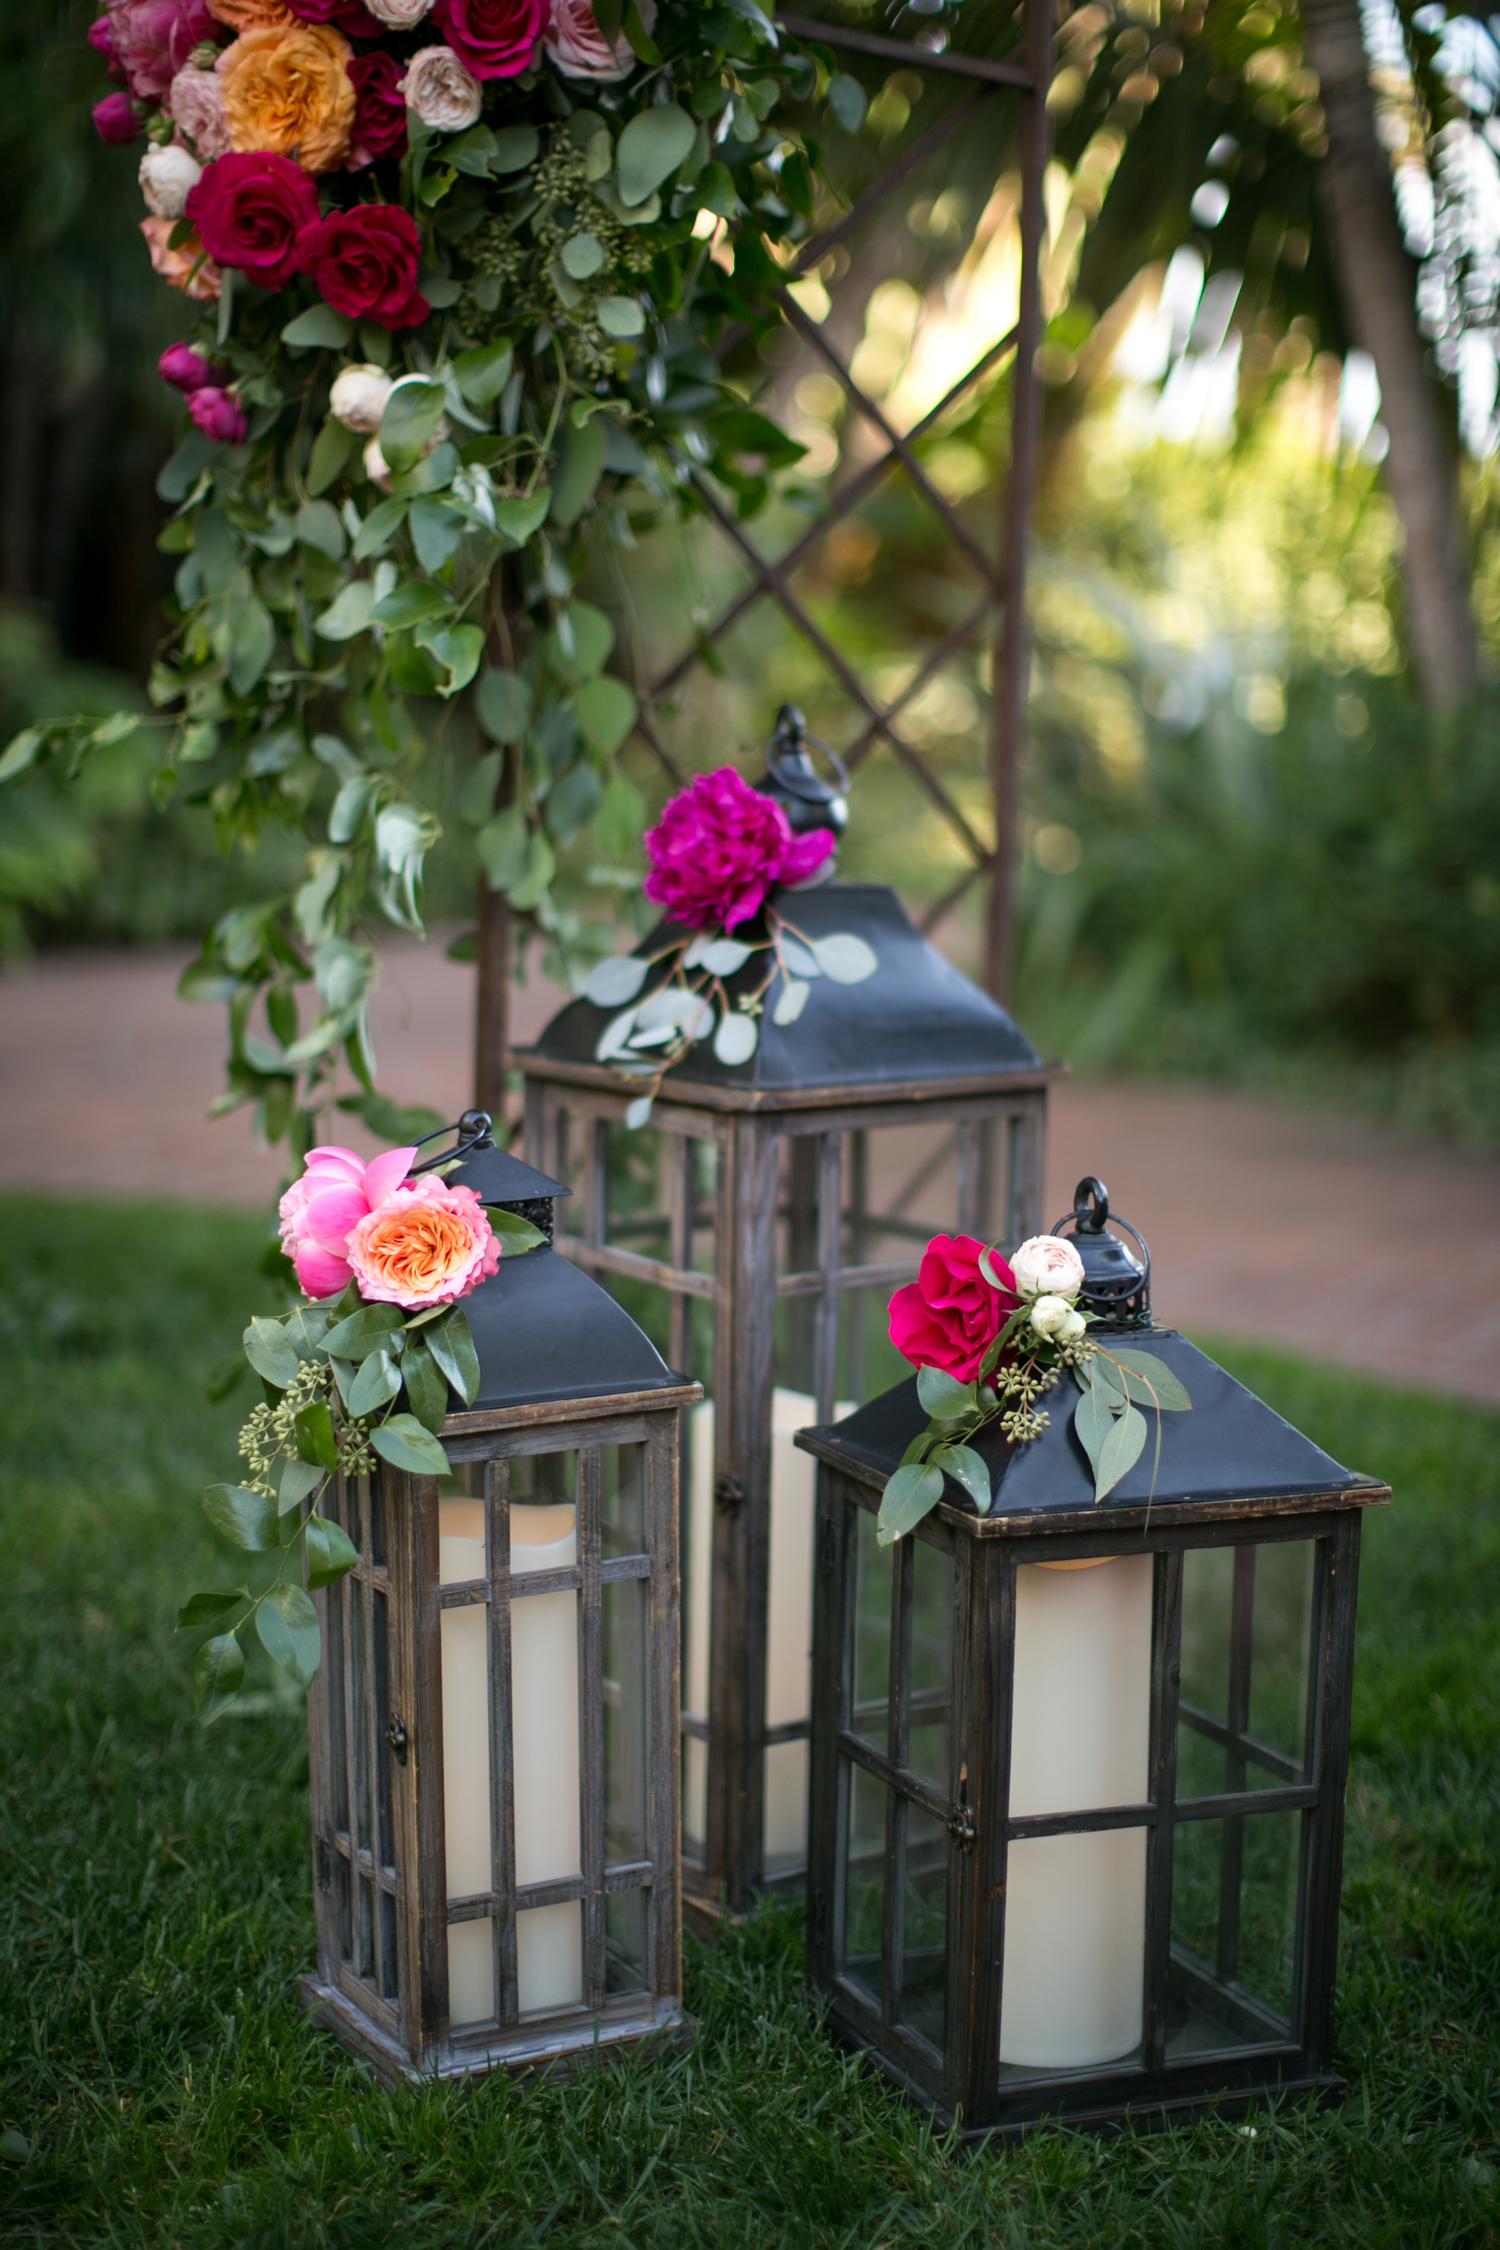 www.santabarbarawedding.com | Miki & Sonja Photography | Four Seasons Resort The Biltmore | Imagine Weddings & Special Events | Rockrose Floral Design | Lanterns